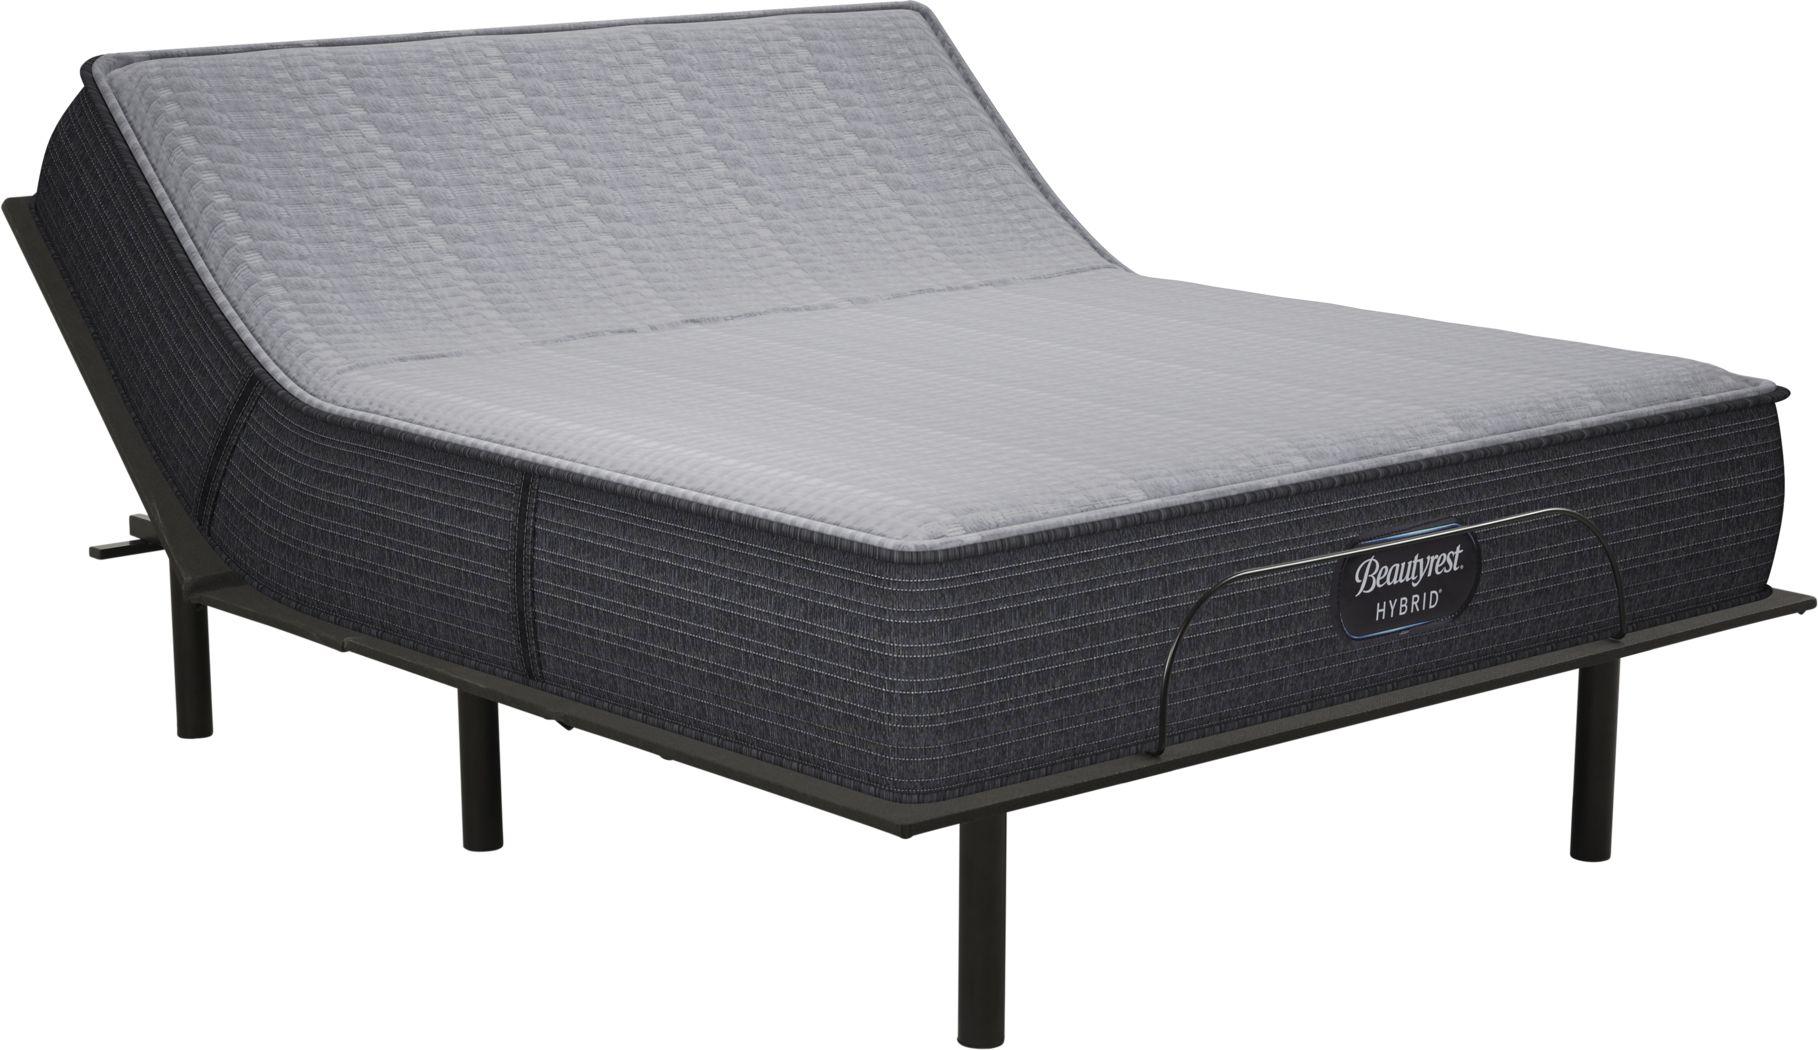 Beautyrest Hybrid Pacific Blue King Mattress with RTG Sleep 2000 Adjustable Base